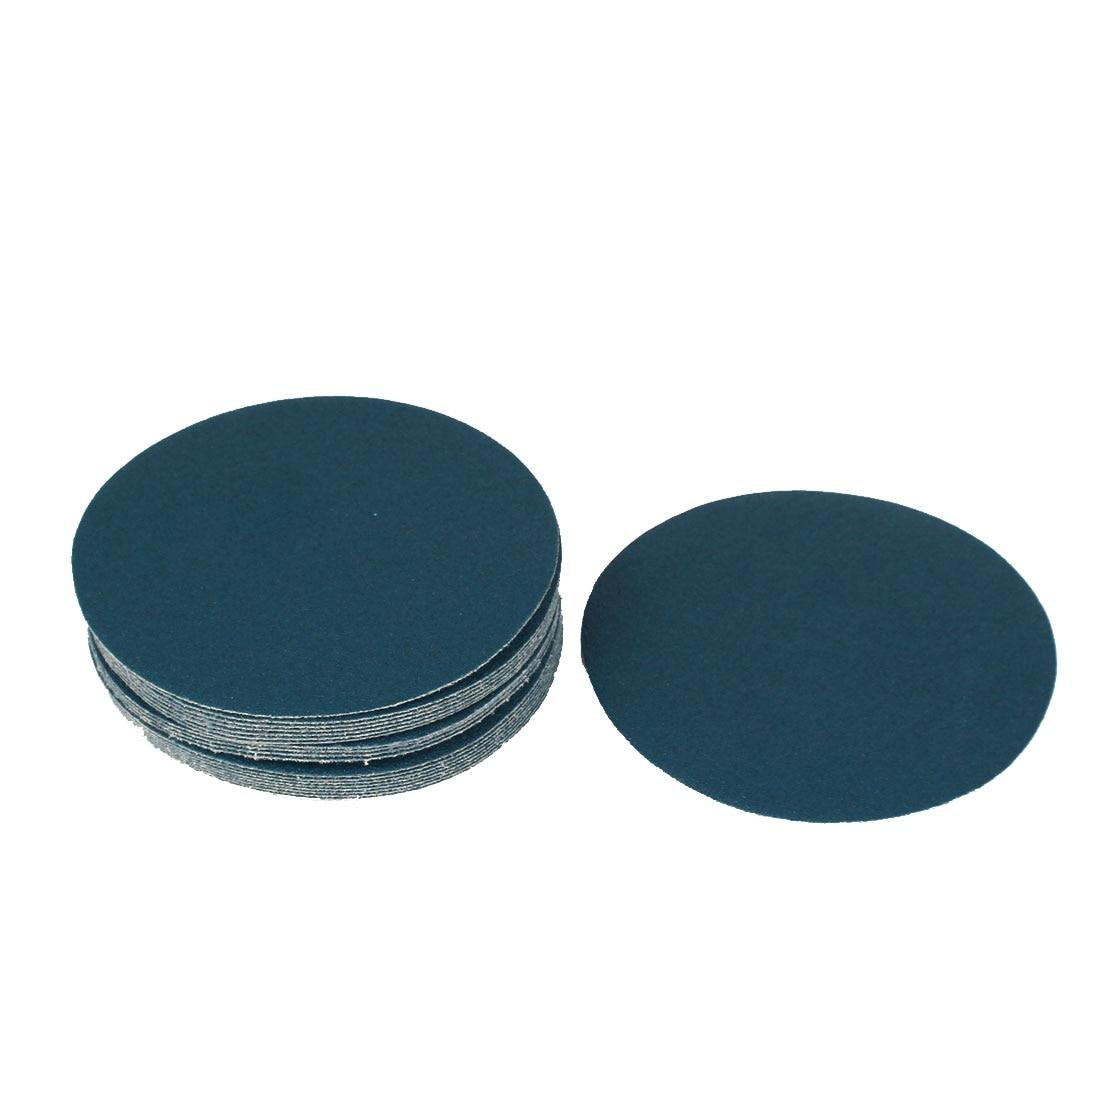 "5"" Sandpaper Auto Car Paint Polishing Sanding Disc Hook And Loop Fastener 100 Grit 20Pcs"